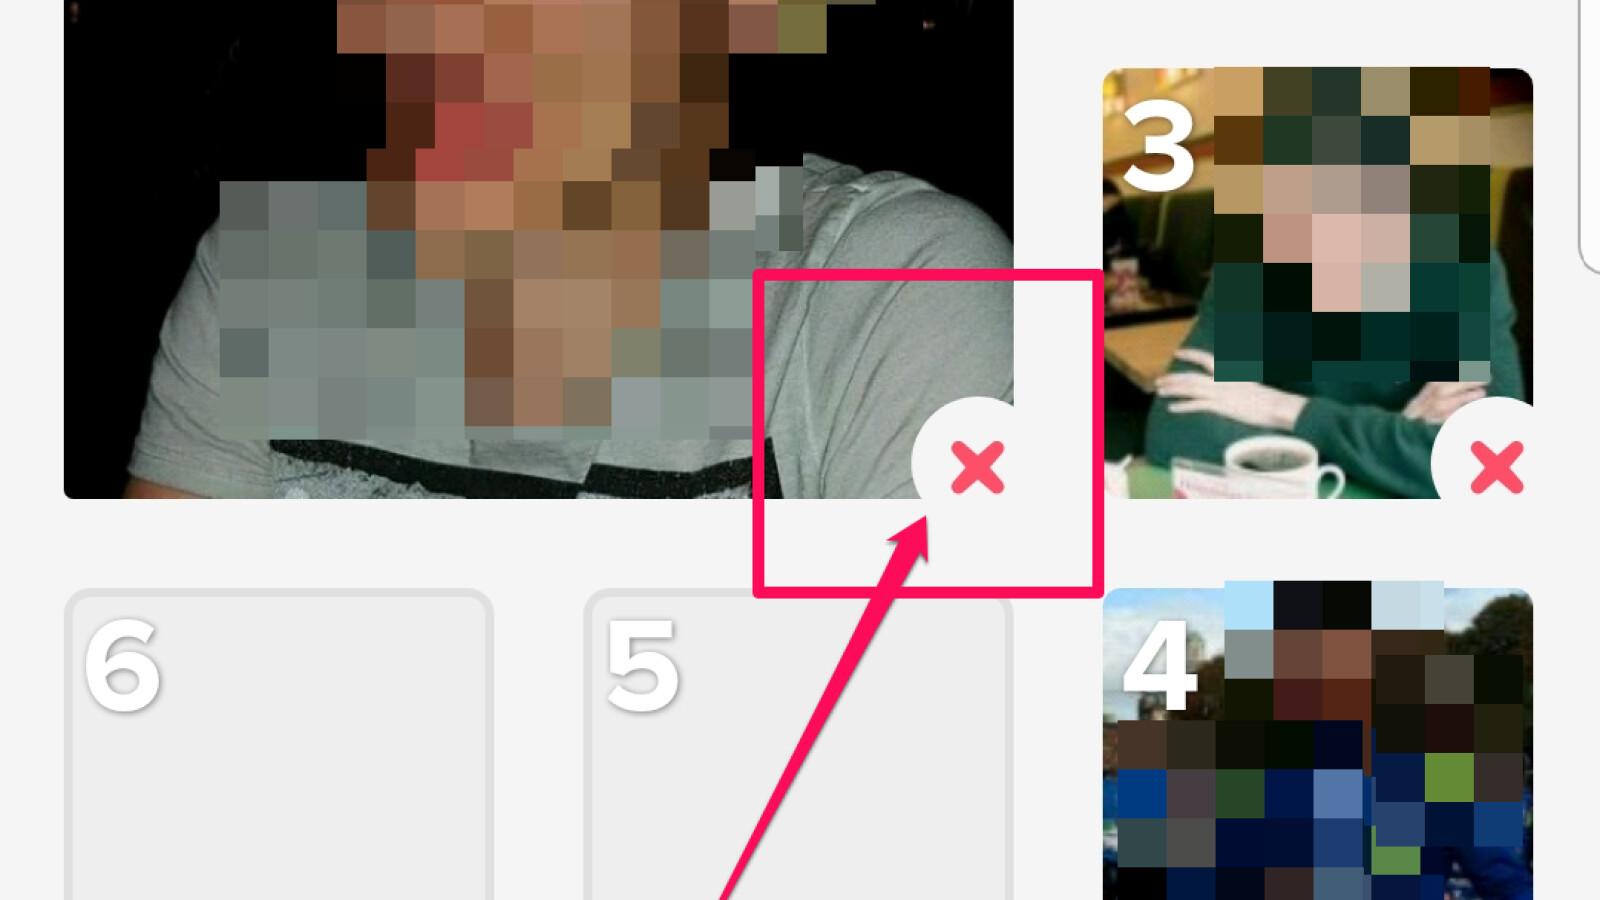 Bilder reihenfolge ändern tinder Tinder: Profilbild